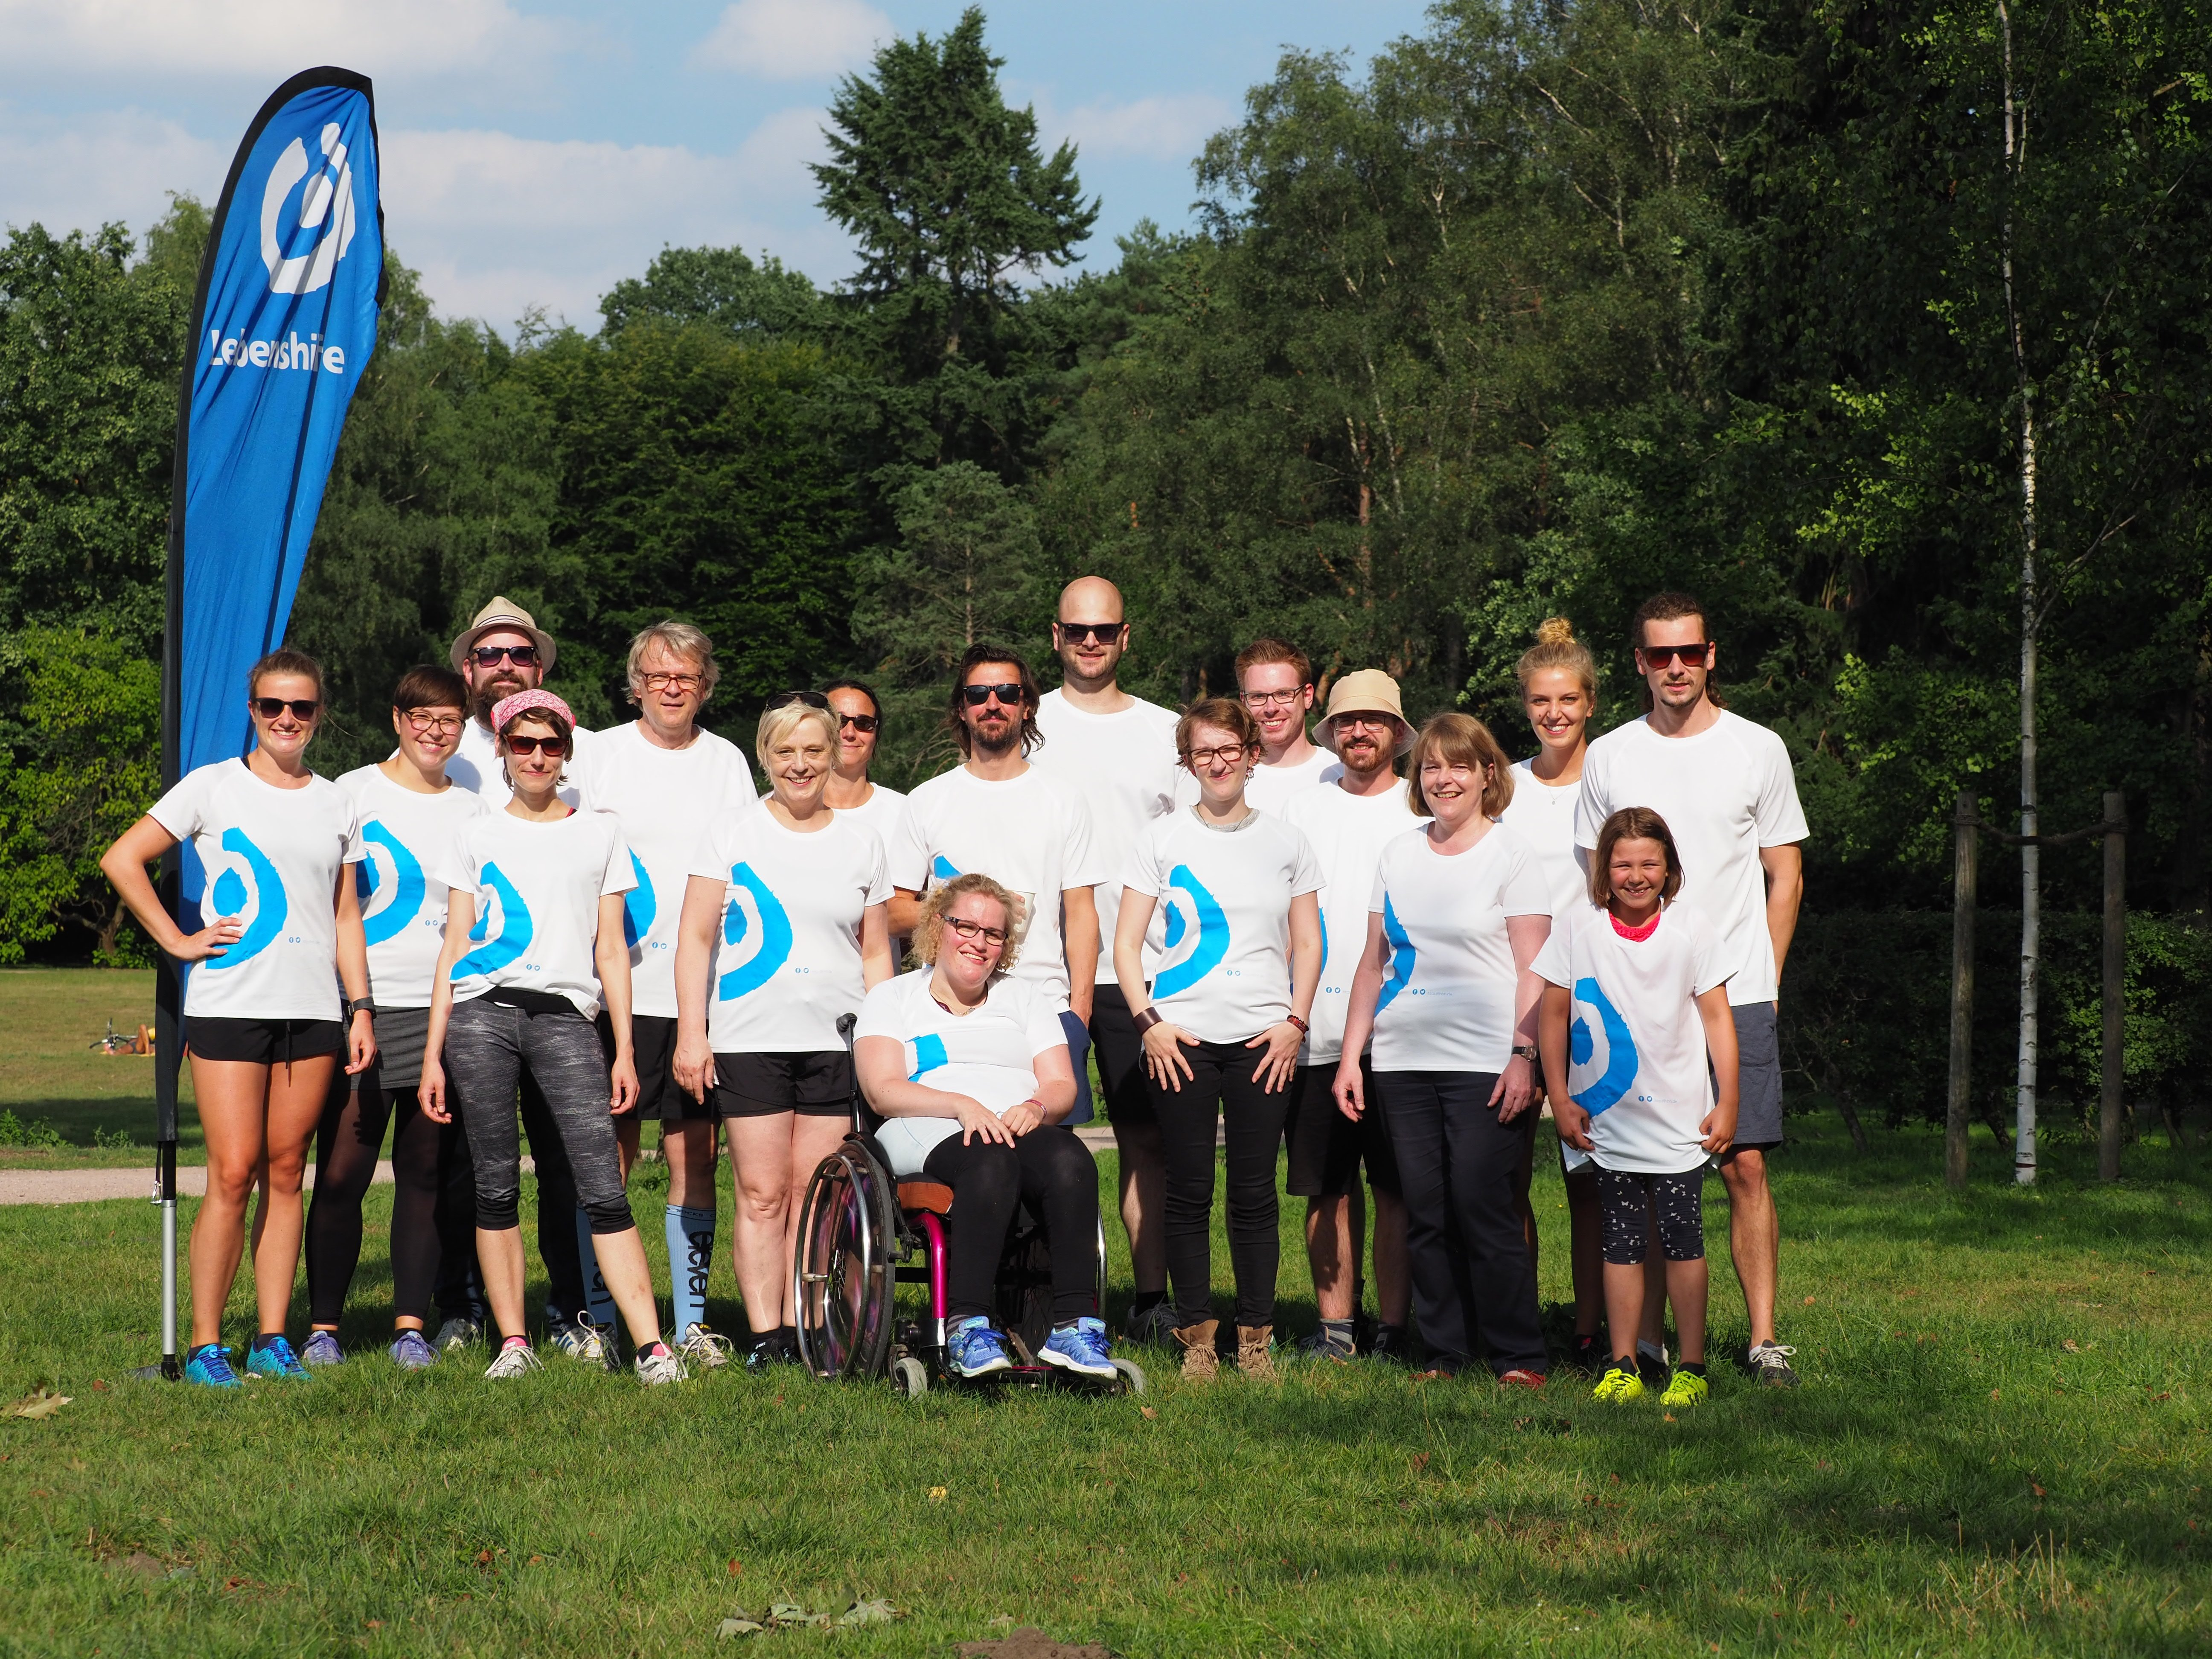 Gruppenfoto mit Lebenshilfe-Tshirts